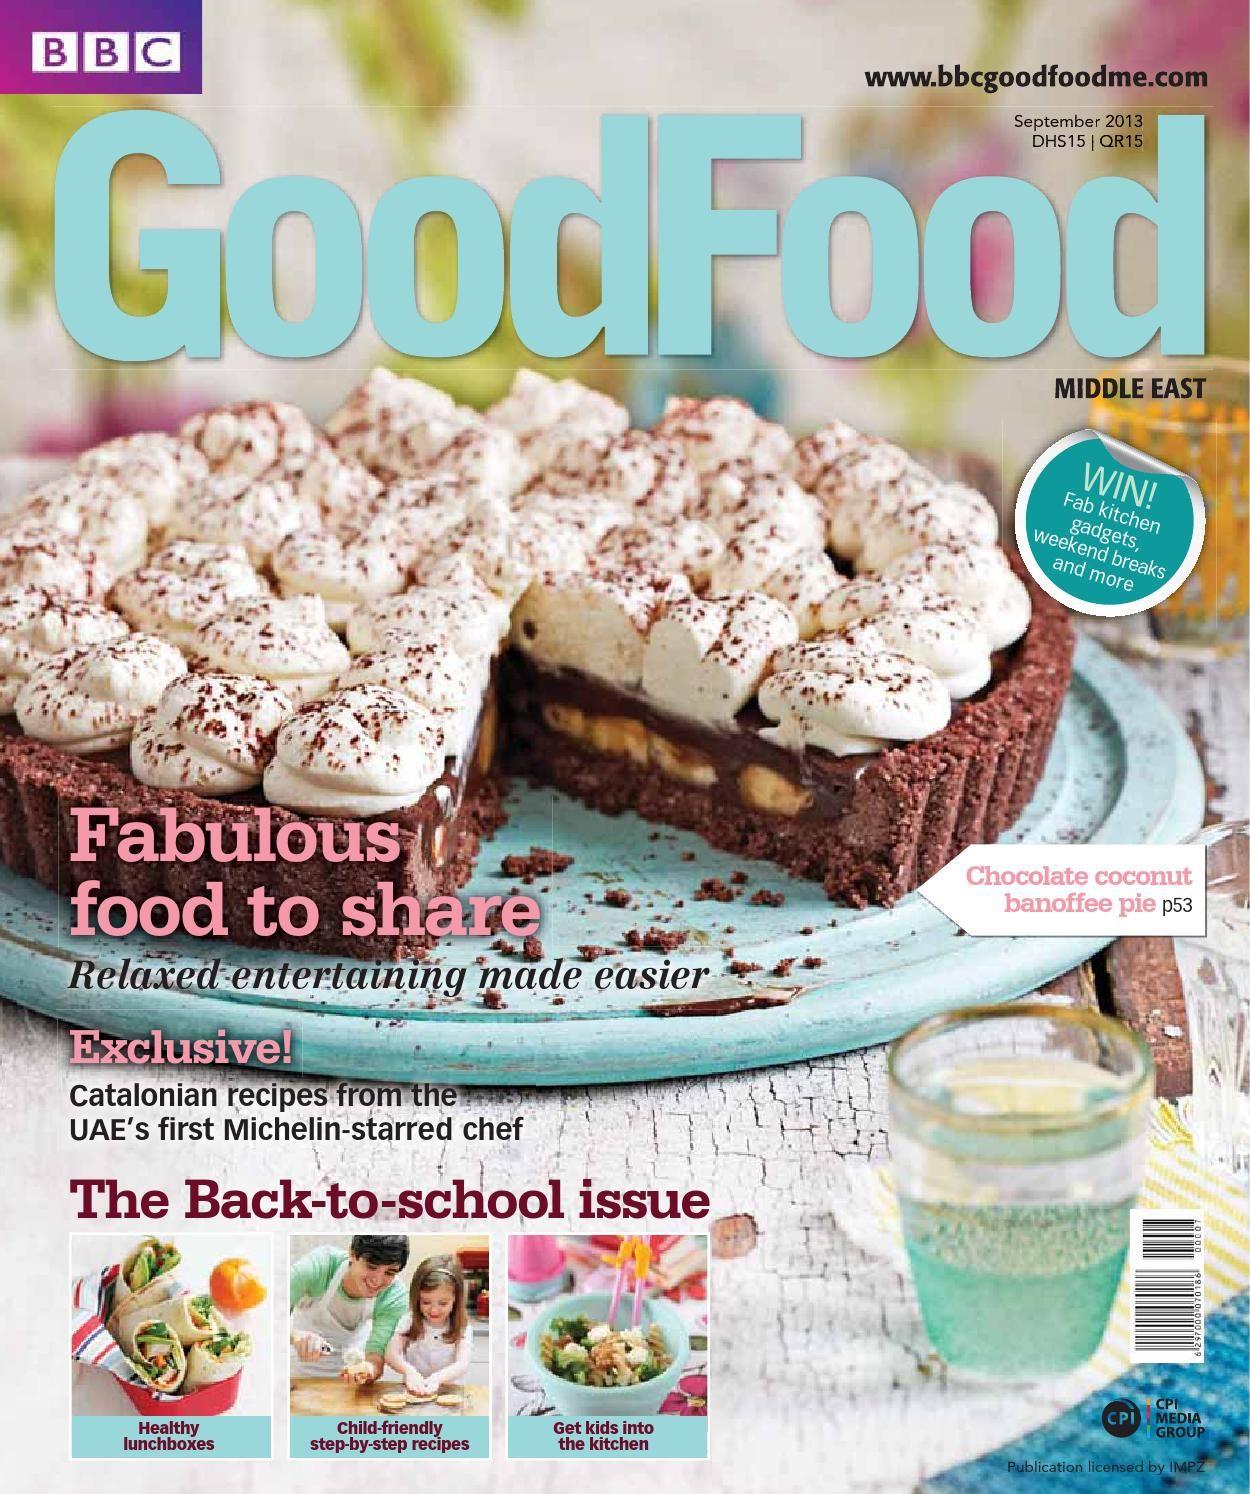 Bbc good food me 2013 sept bbc and food bbc good food me 2013 sept forumfinder Images